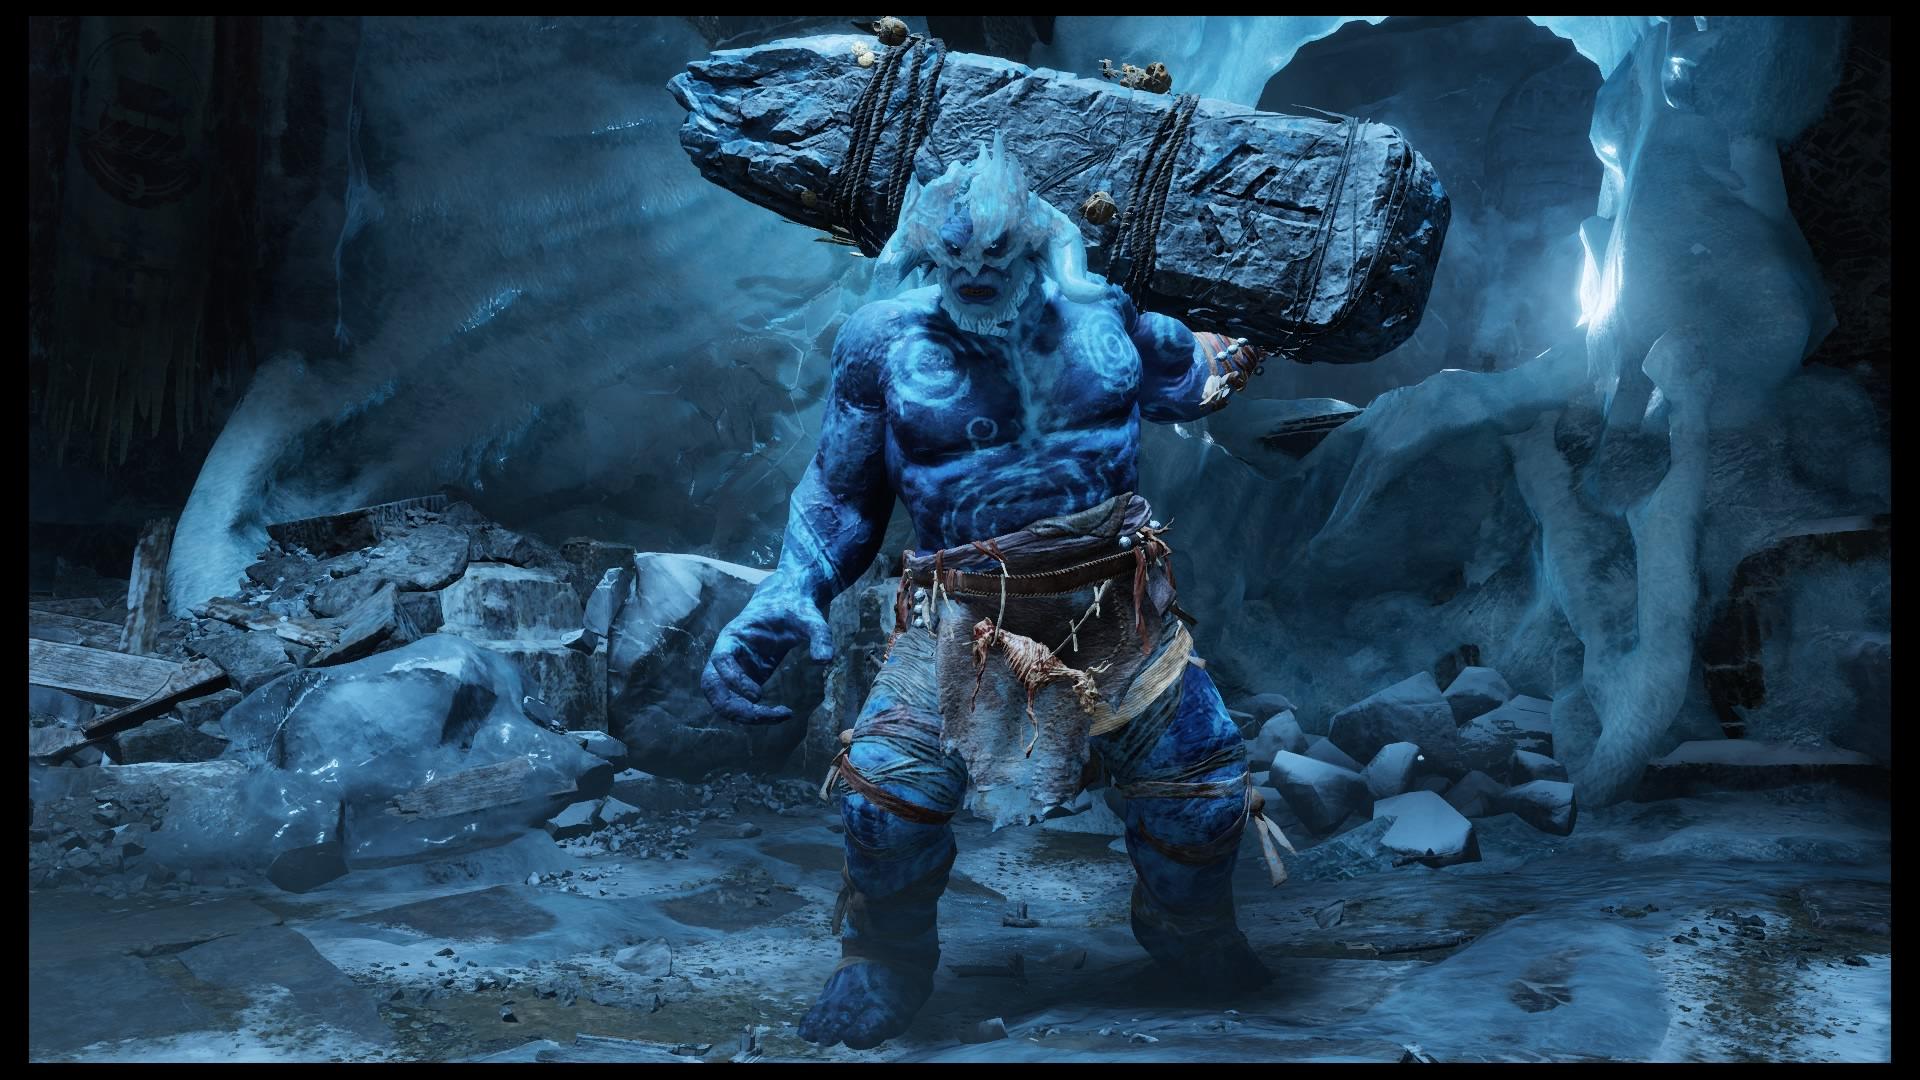 Stonebeard King